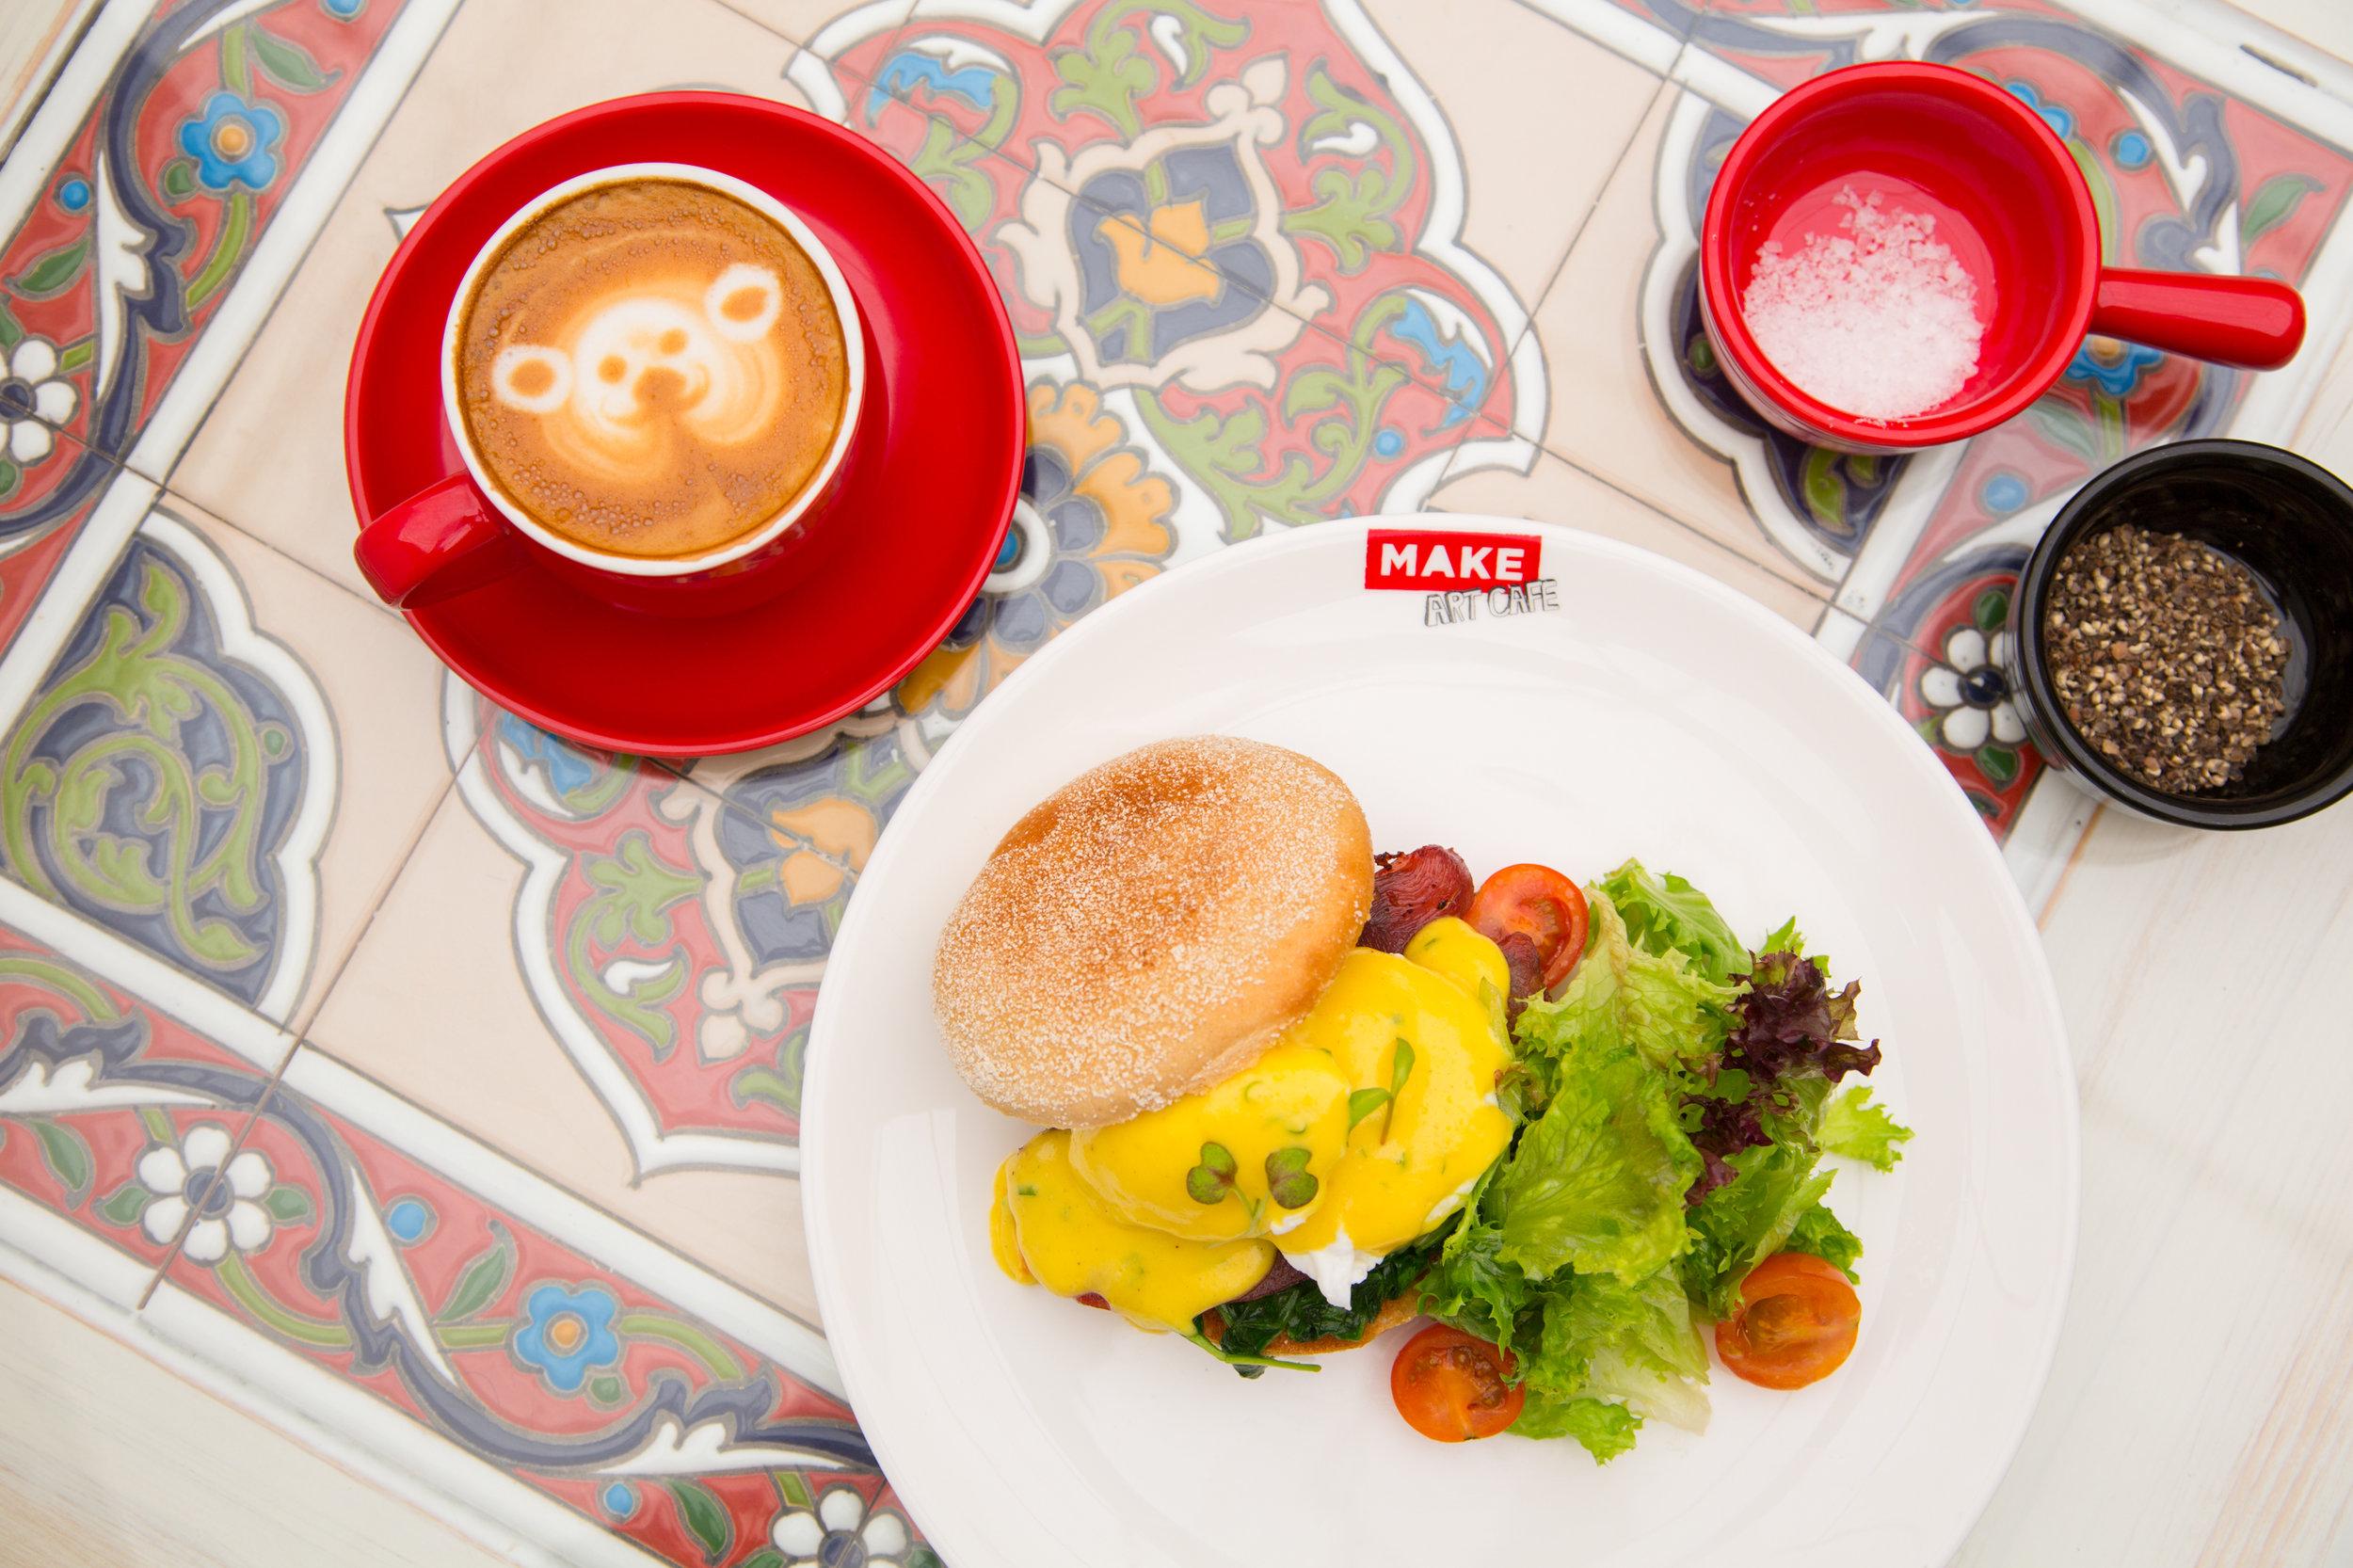 MAKE-BreakfastMenu-10.jpg